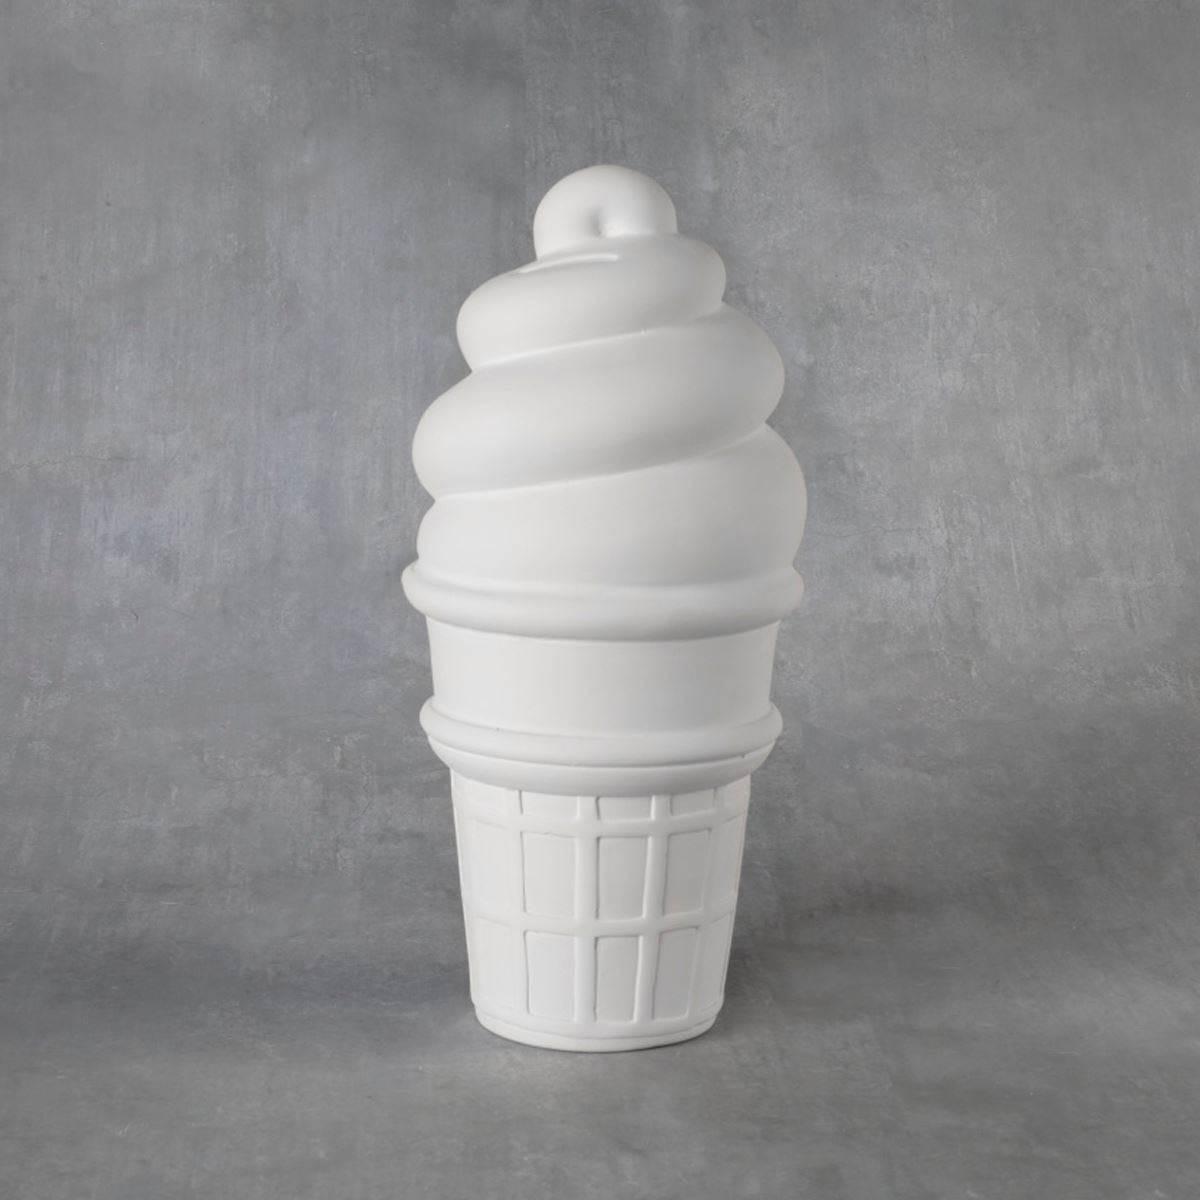 BQ LRG XL ICE CREAM CONE BANK